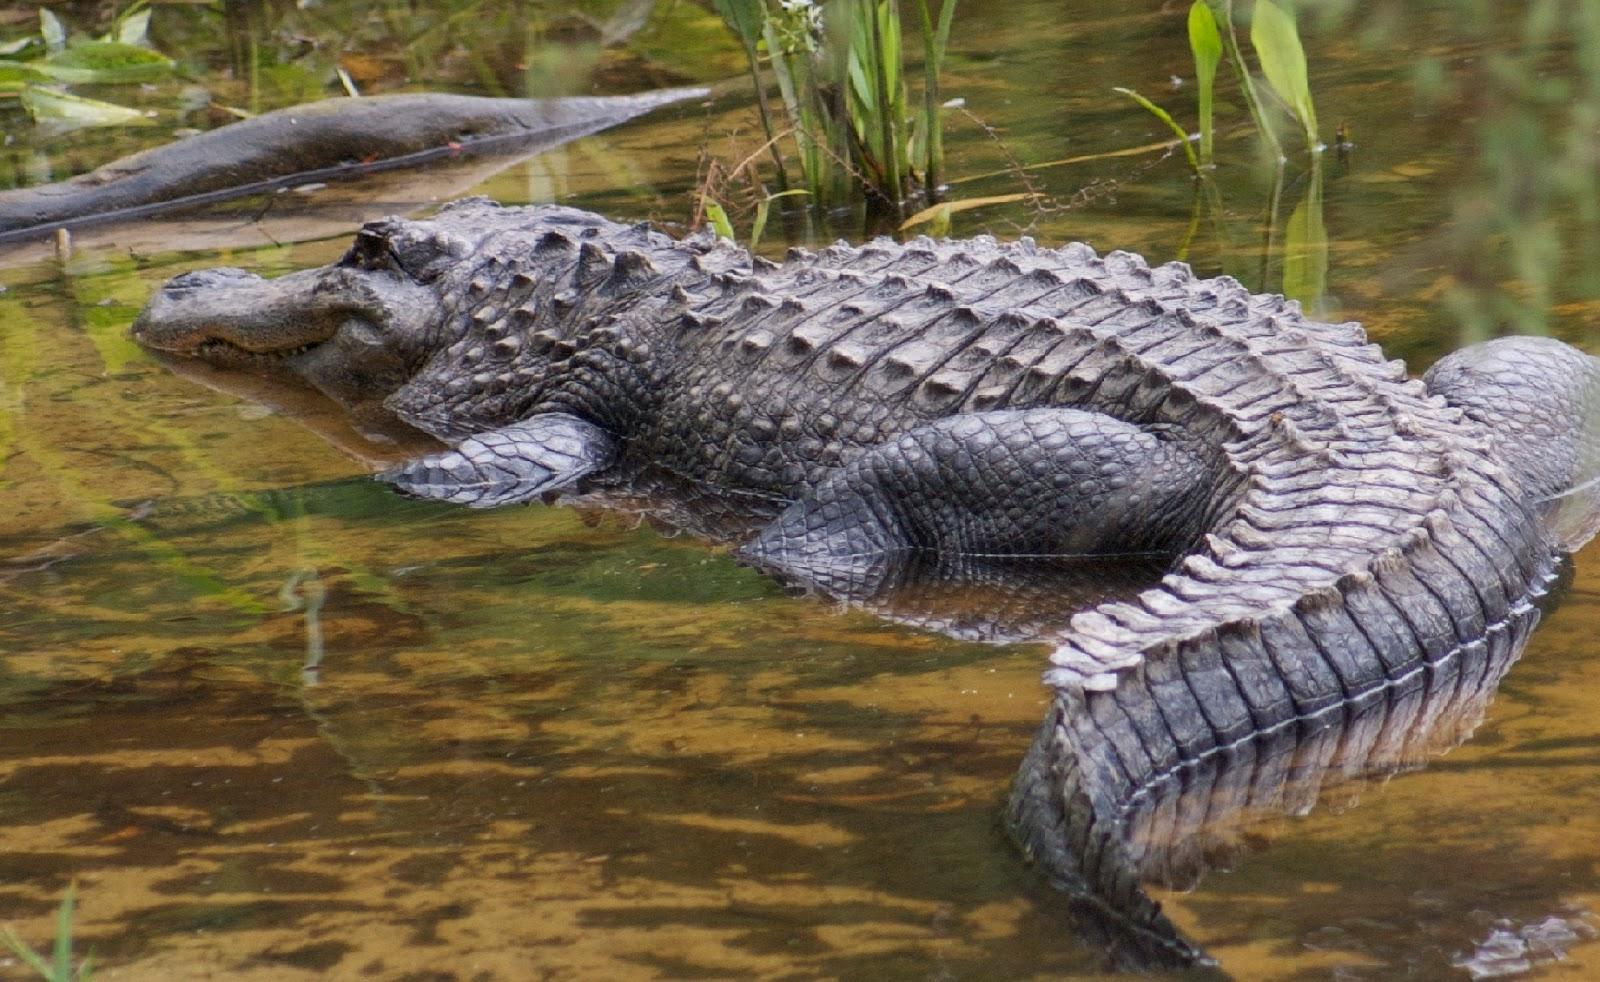 Crocodile - HD Wallpapers | Earth Blog